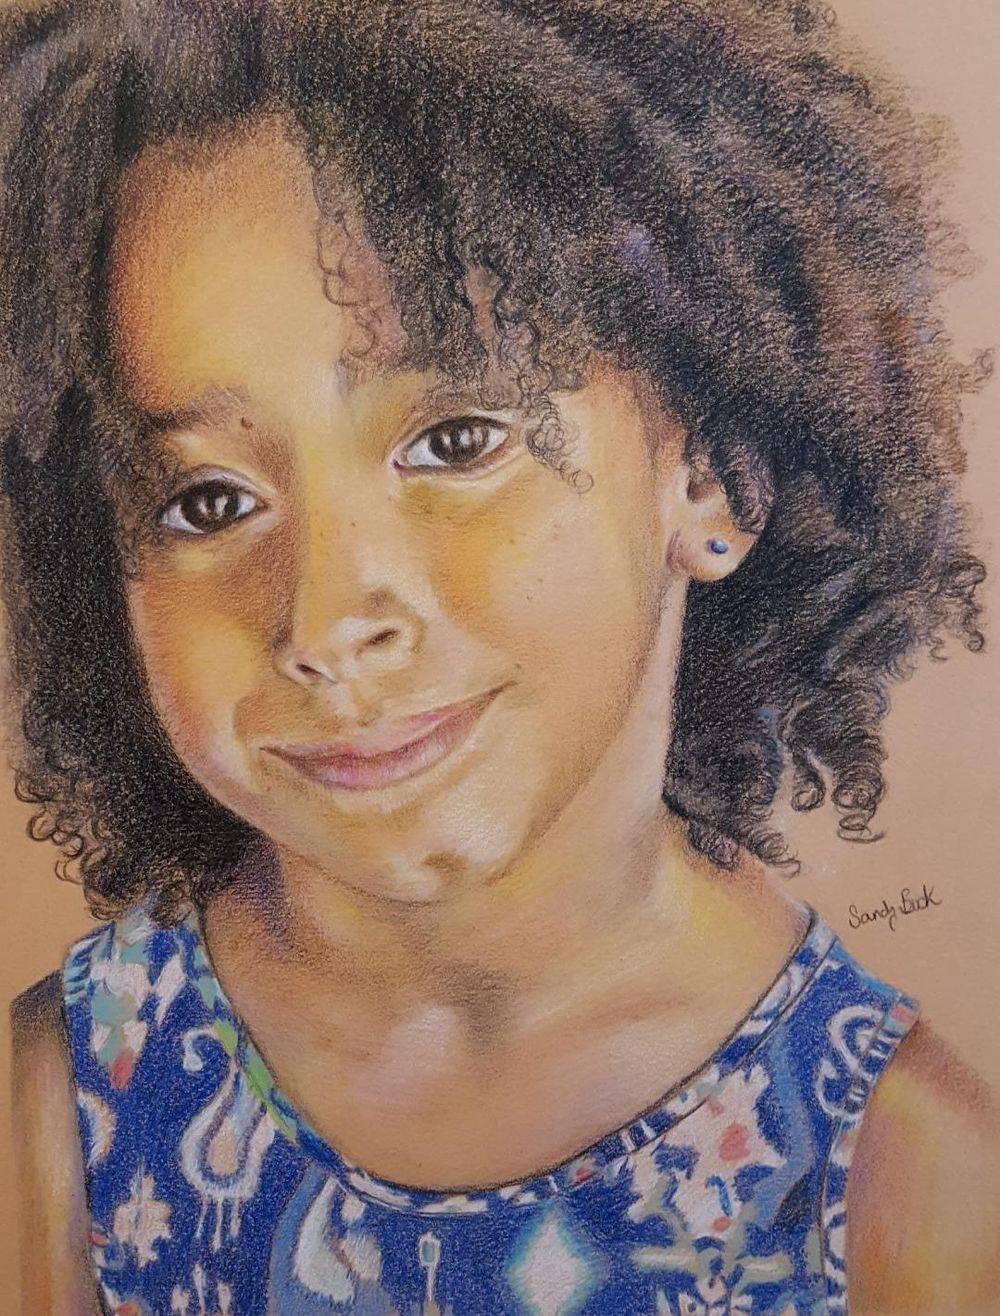 sandy bock, portrait artist, custom portrat painting, portrait art, family portrait, portrait illustration